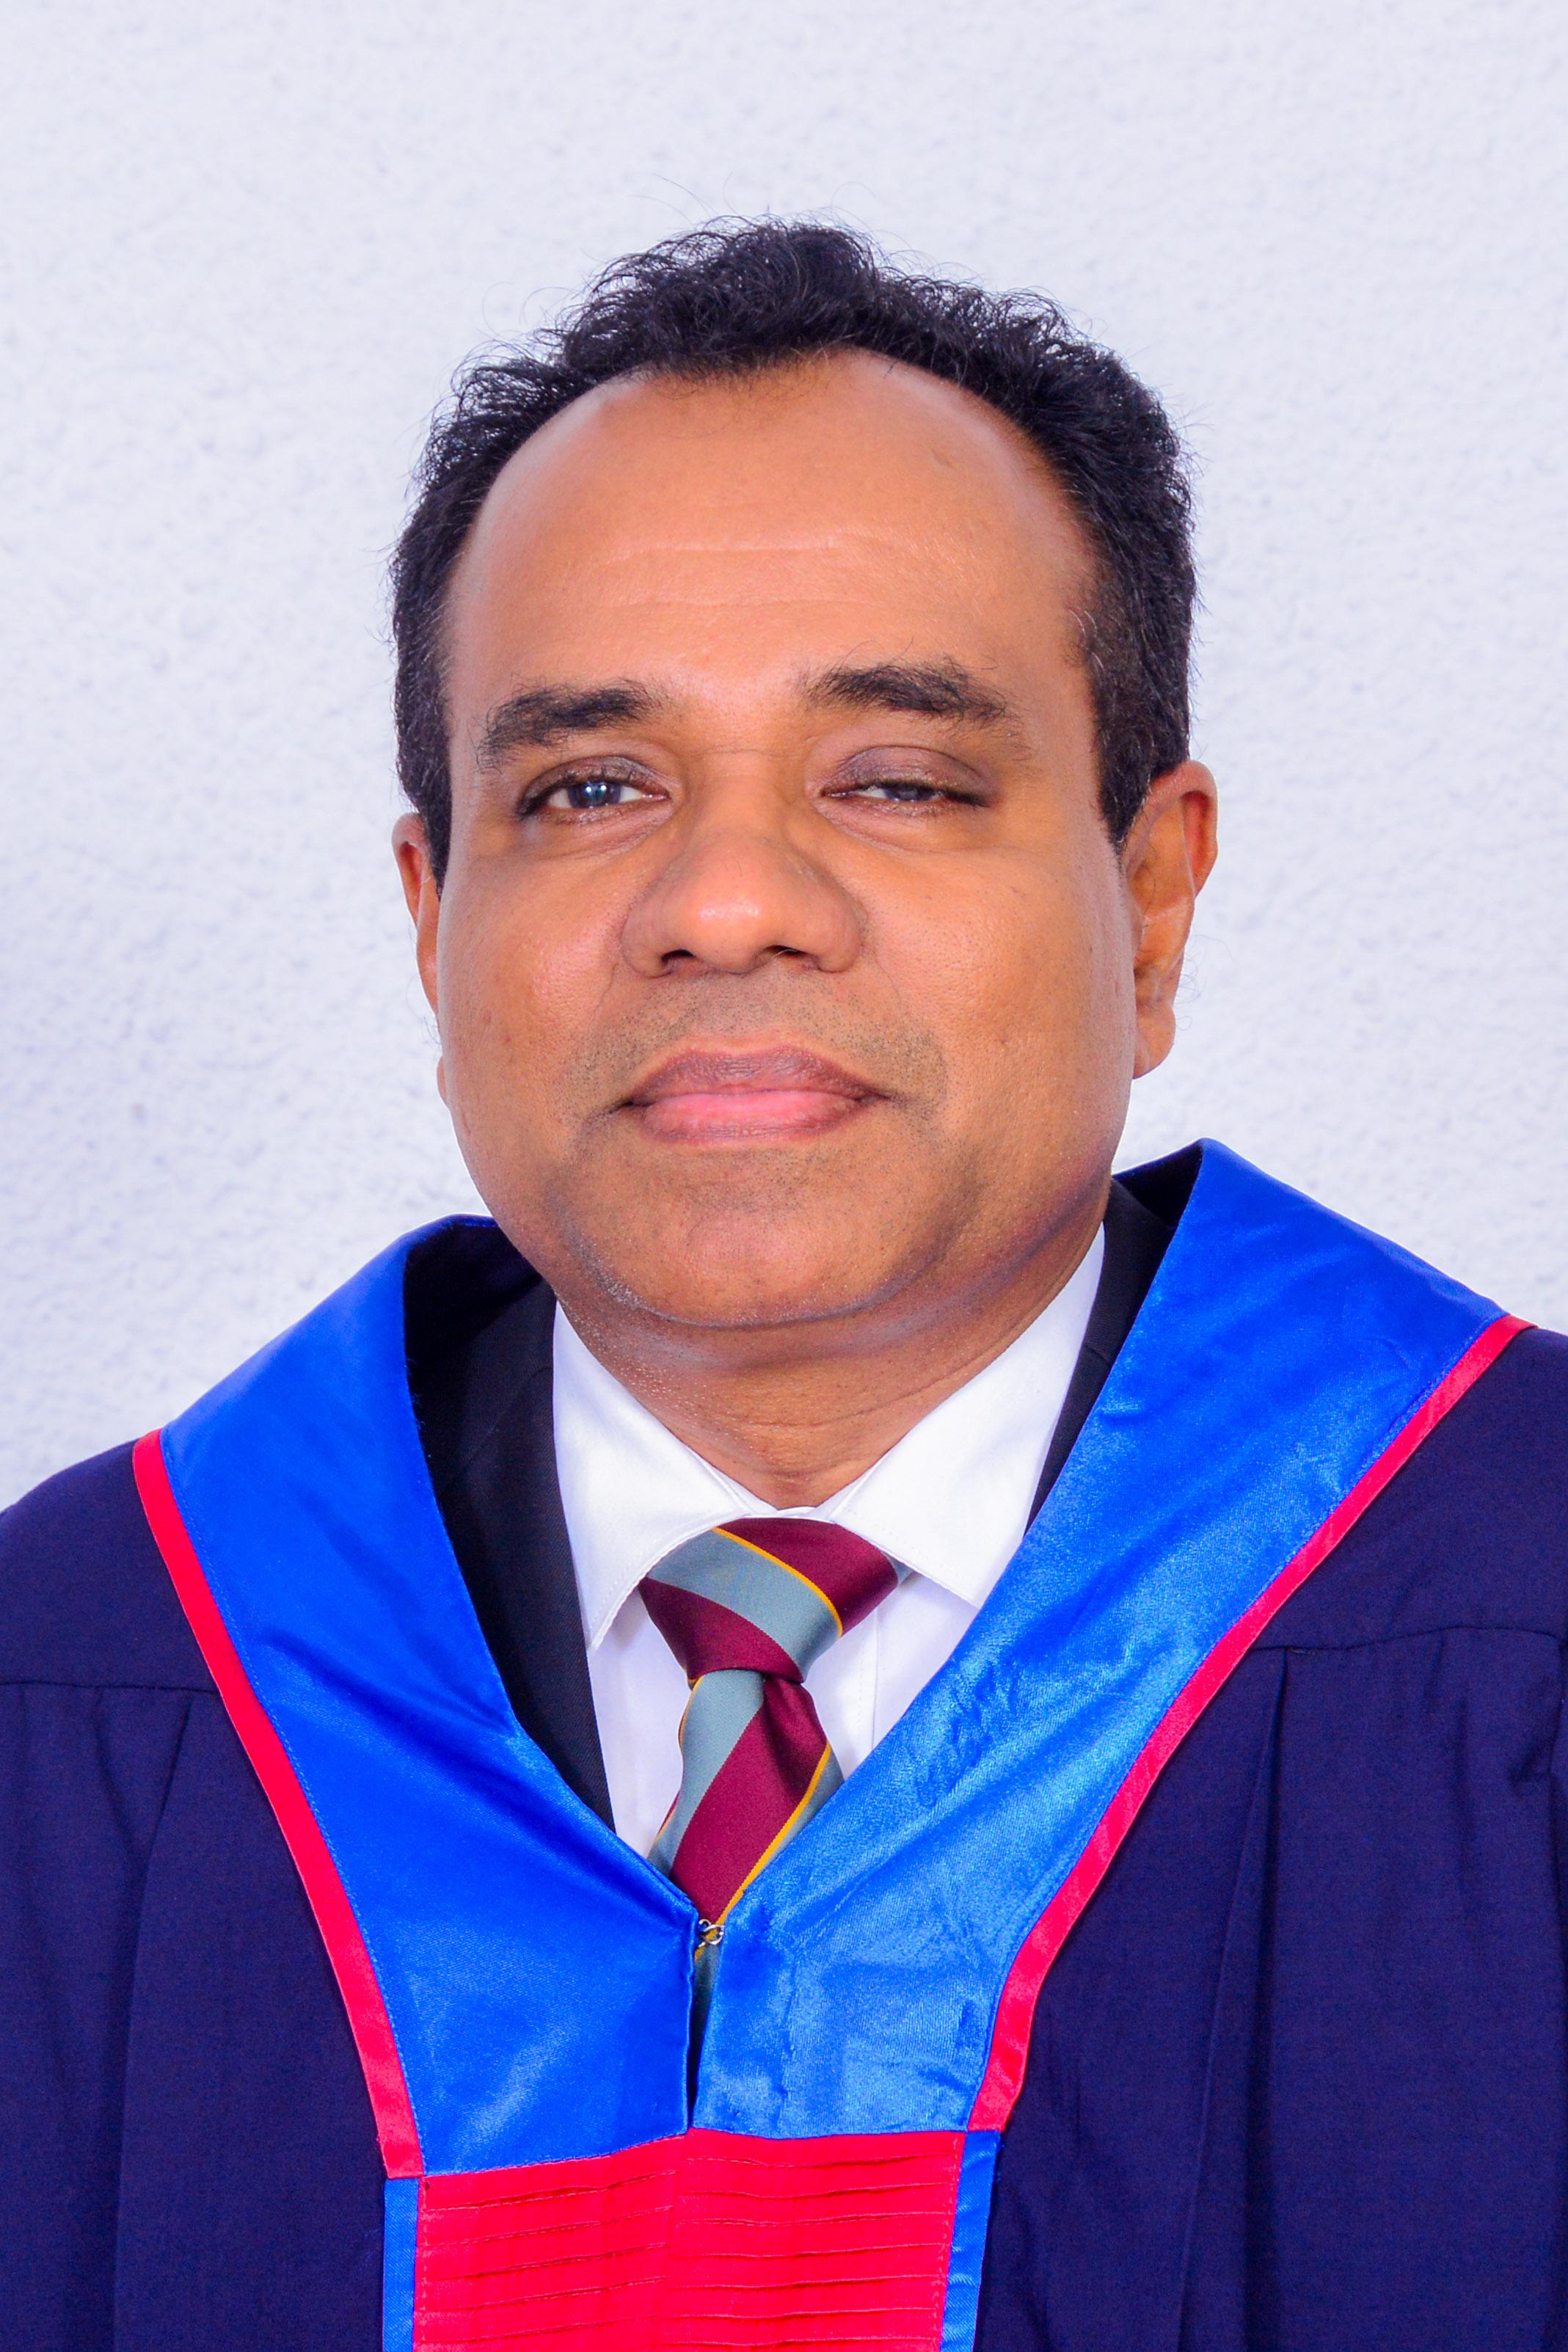 Prof. Vajira H. W. Dissanayake